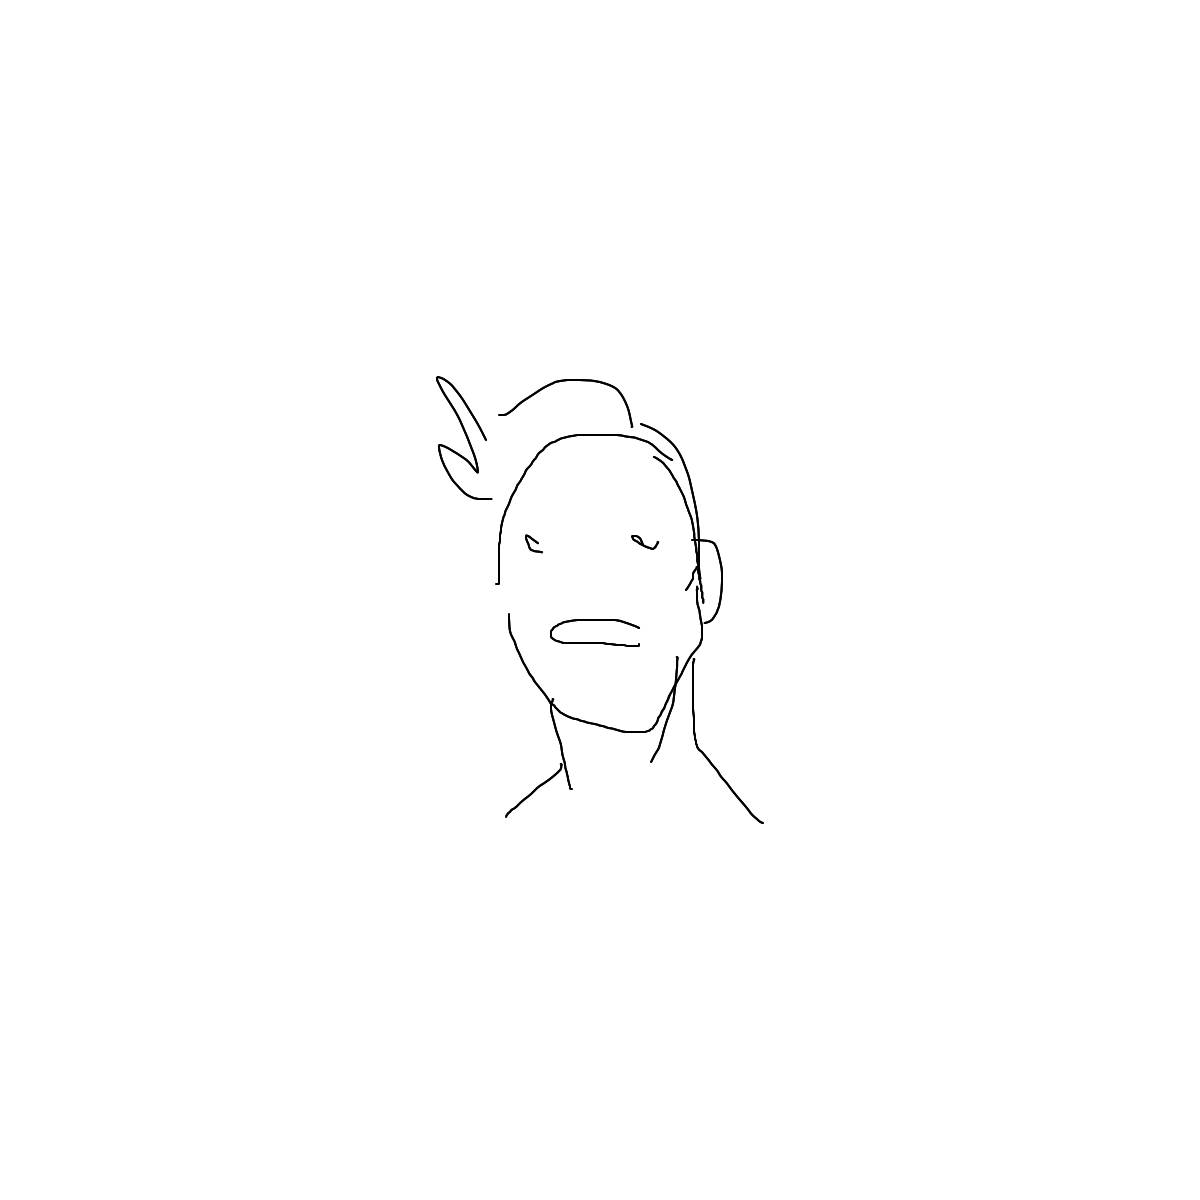 BAAAM drawing#5063 lat:33.0312385559082000lng: -96.6238708496093800